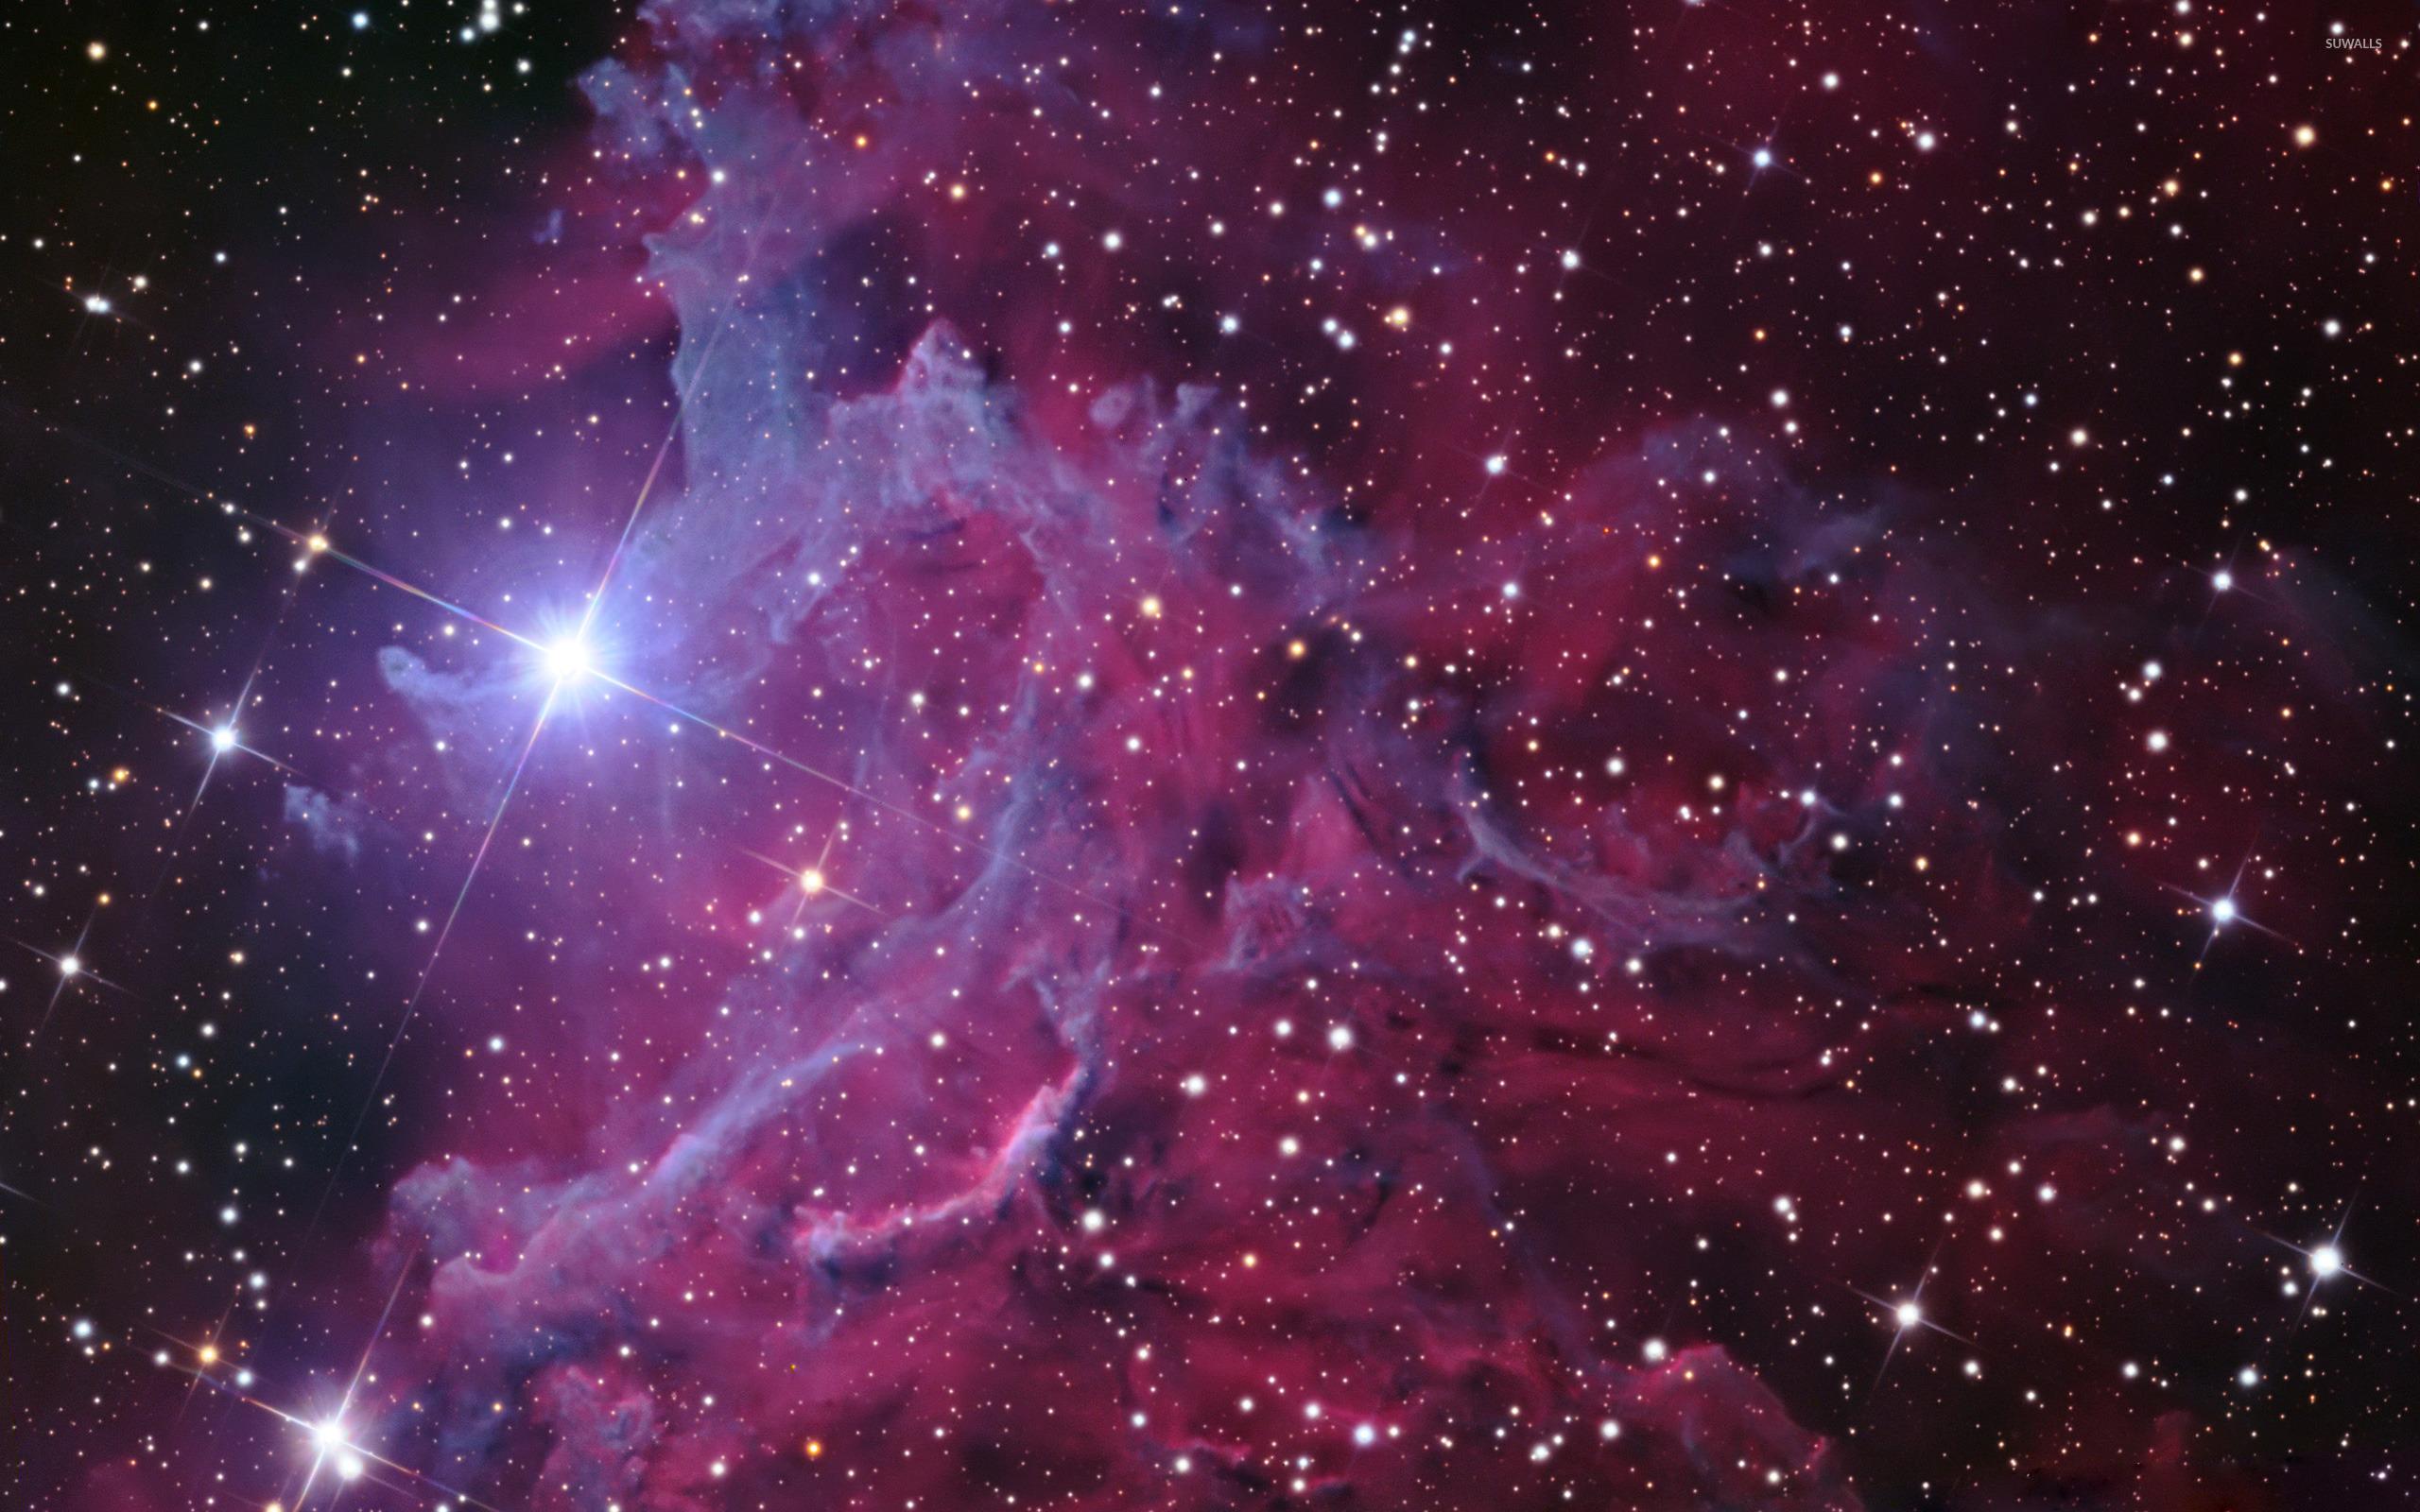 Flaming Star Nebula wallpaper Space wallpapers